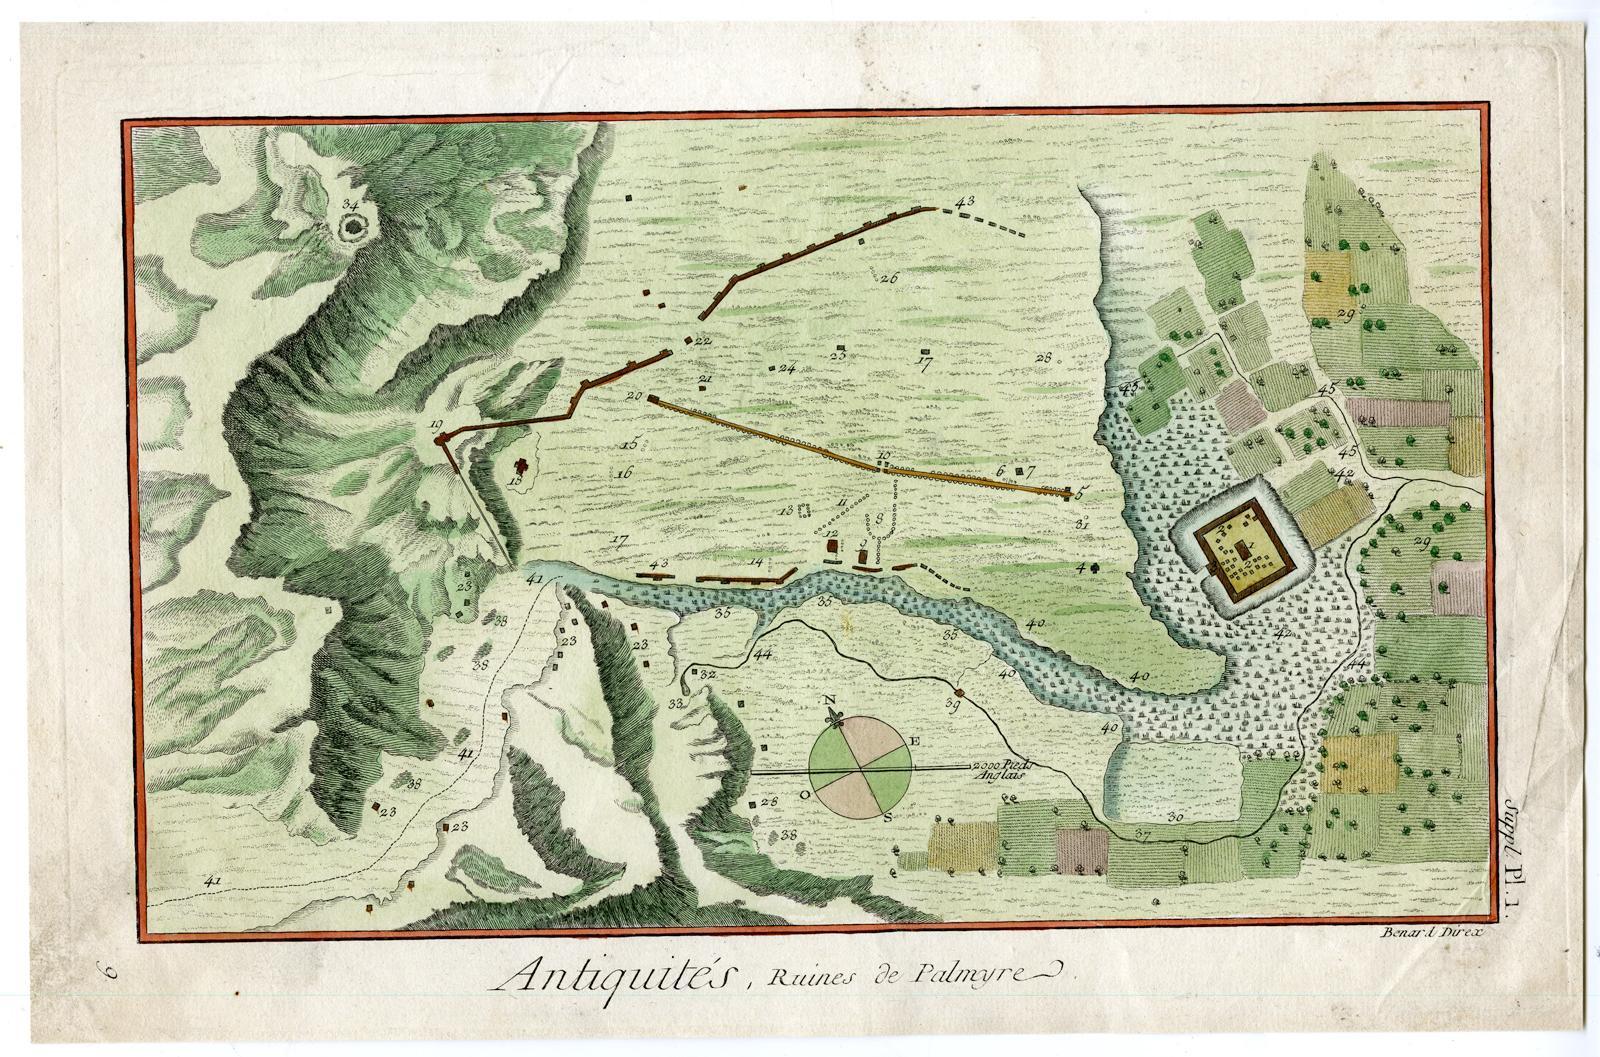 Antique Print-PALMYRA RUINS-SYRIA-Diderot-Alembert-Benard-1751: Benard